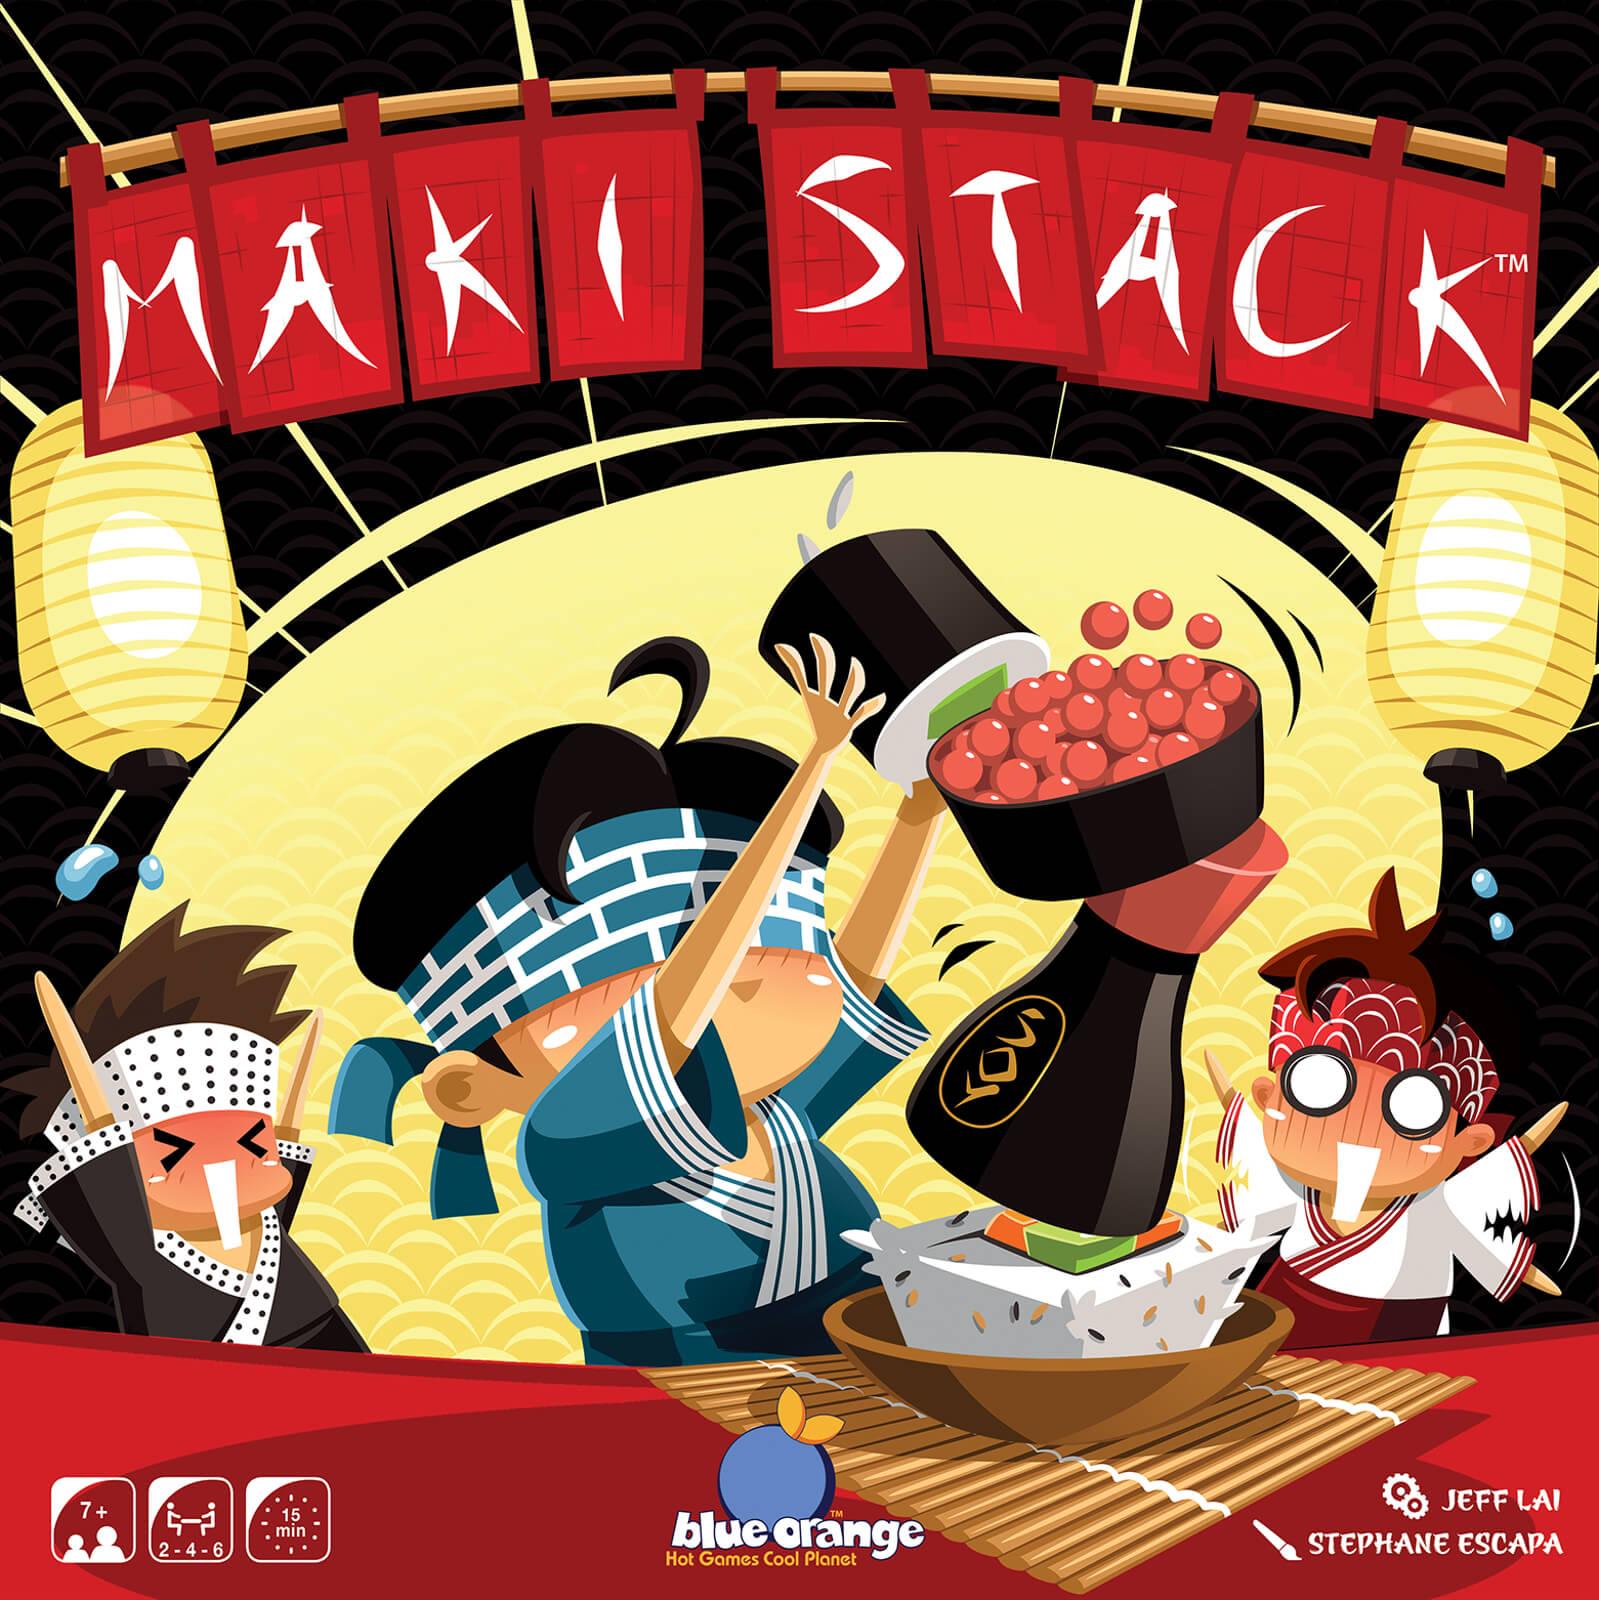 Image of Maki Stack